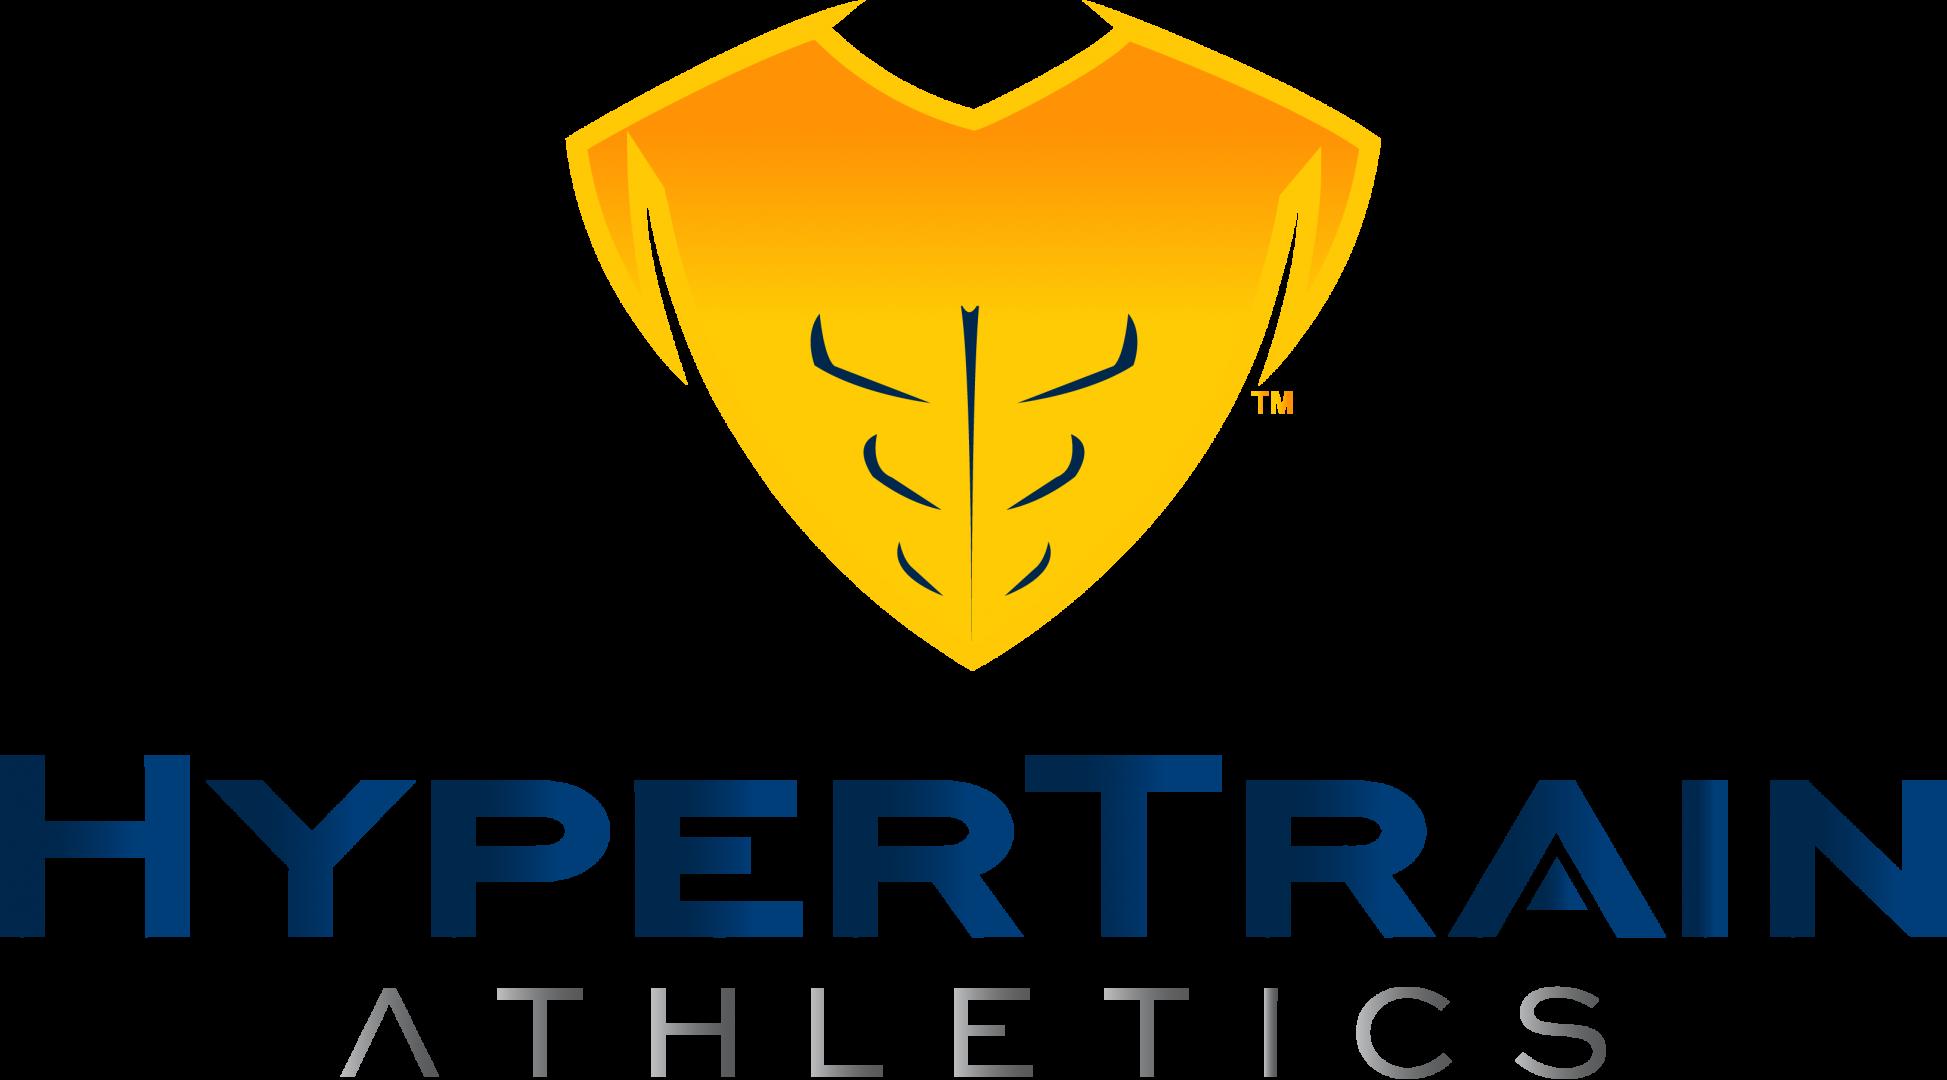 HyperTrain Athletics